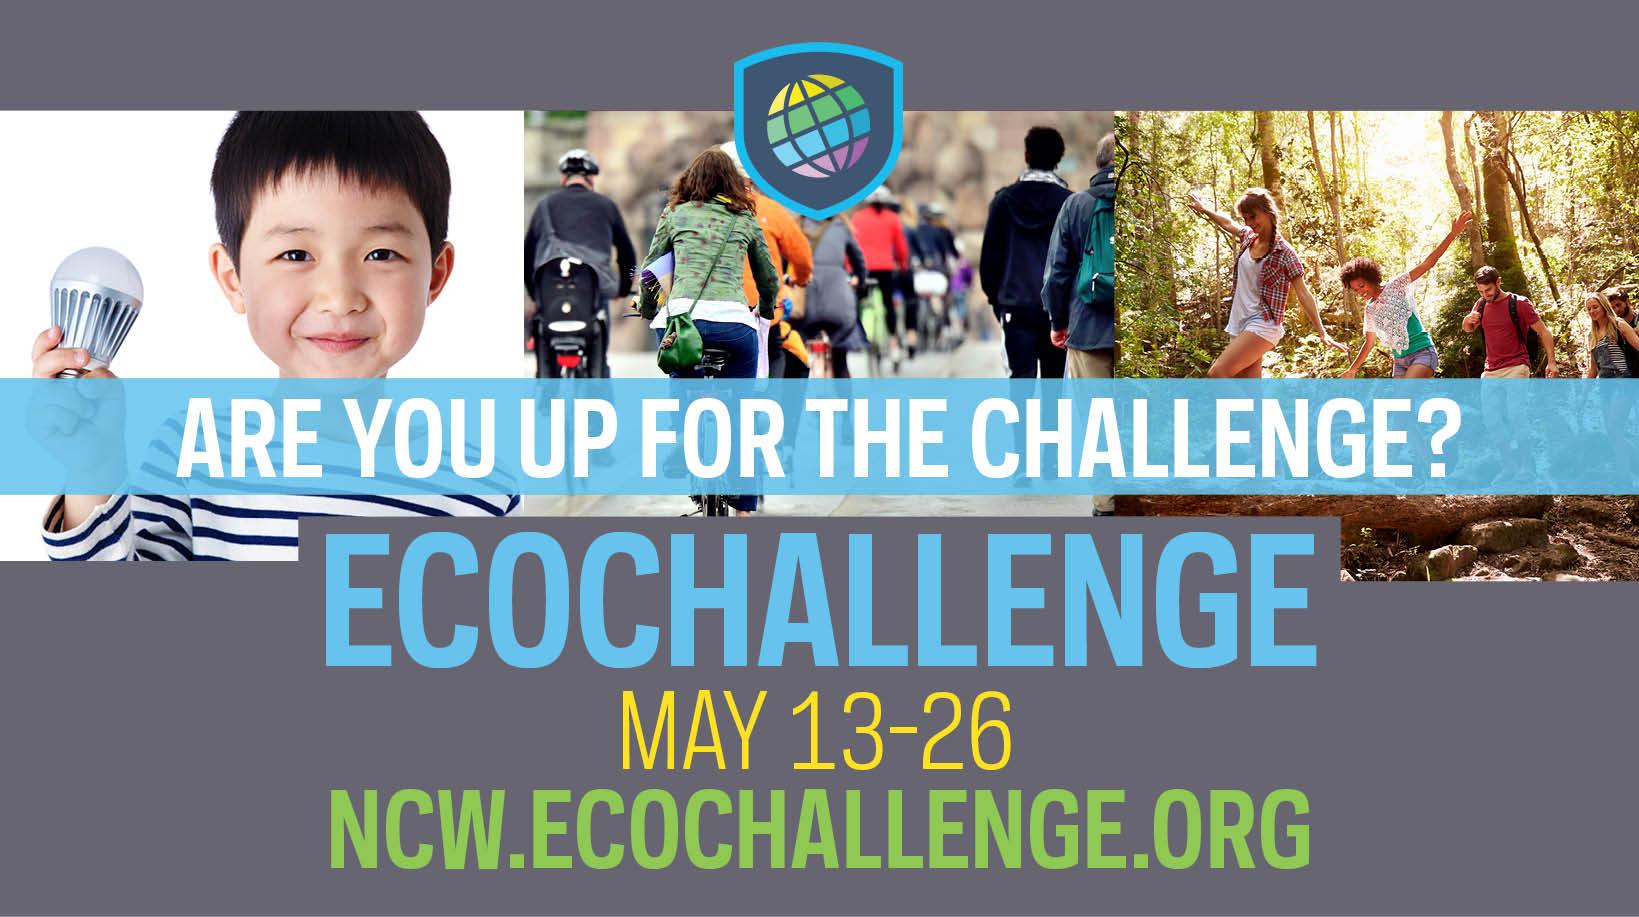 EcoChallenge poster